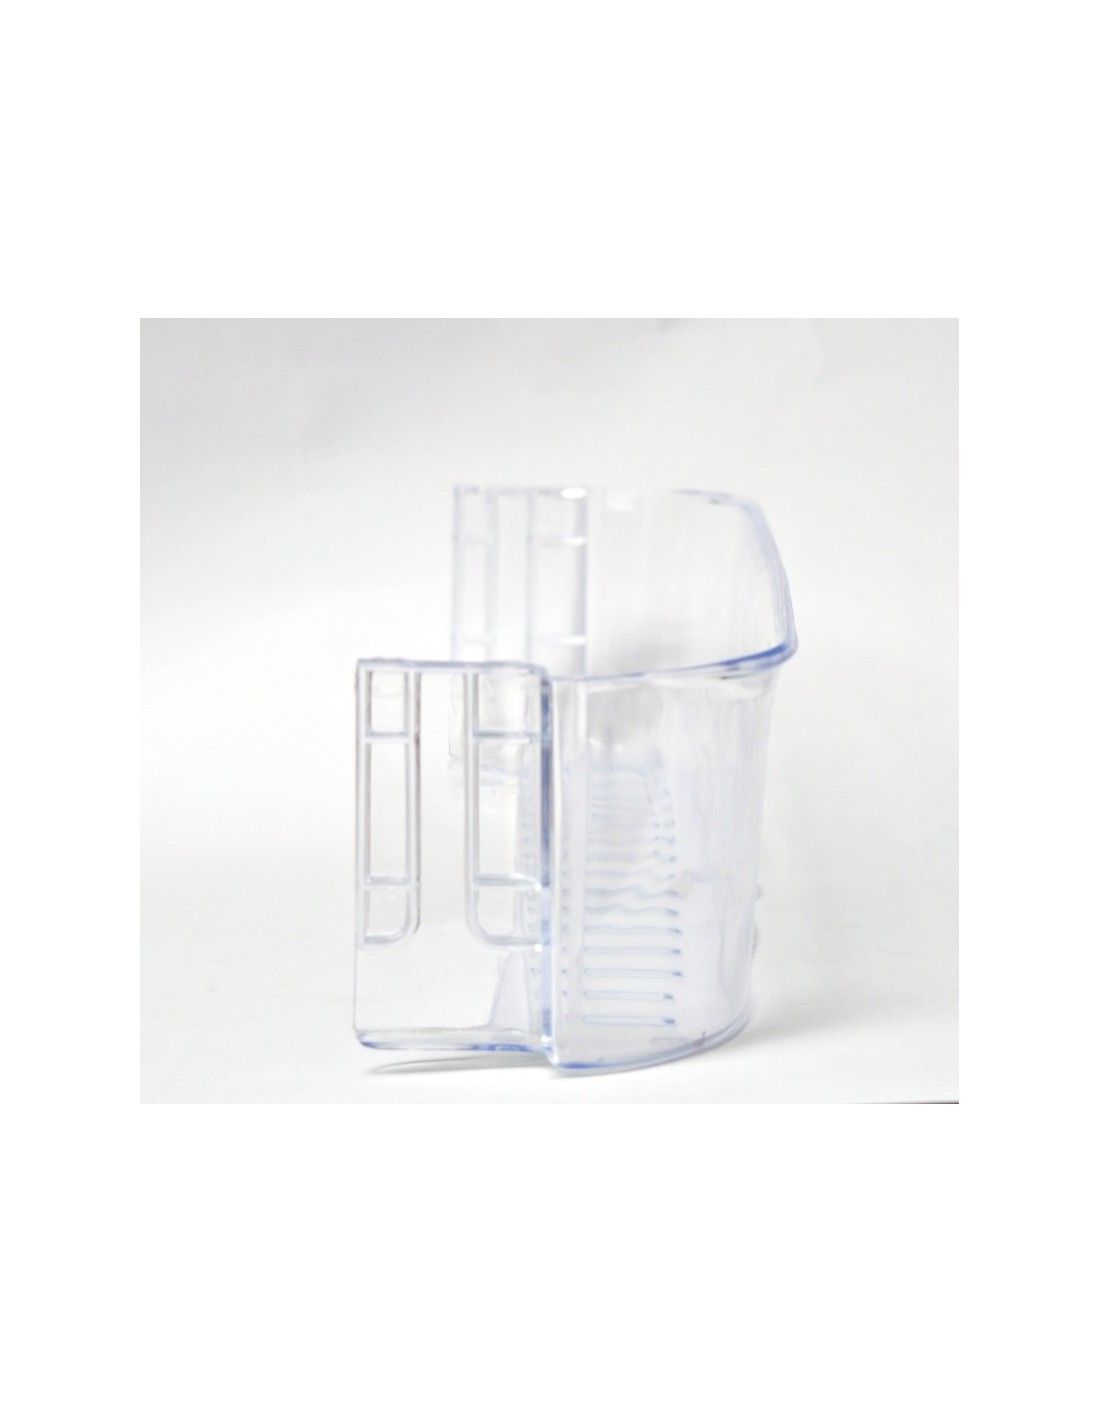 Buy New Whirlpool Bottle Rack Mastermind Online In India